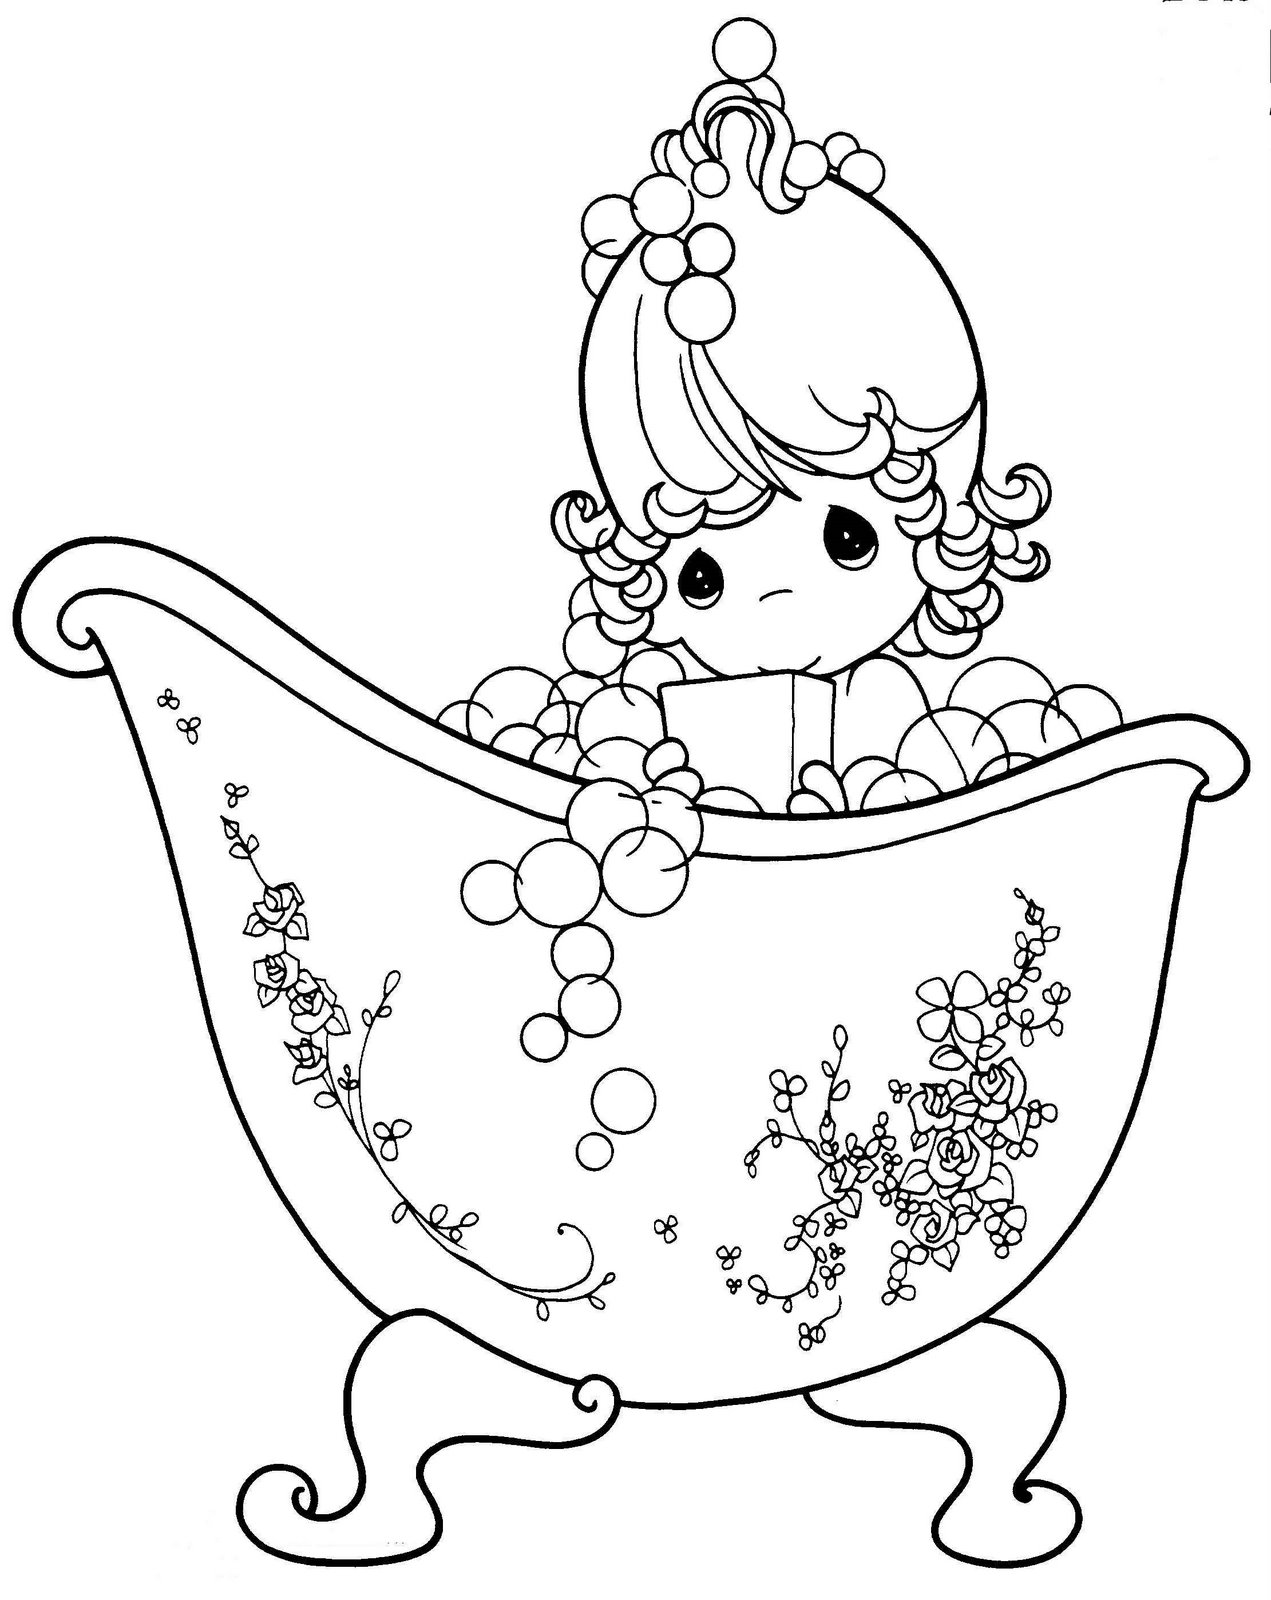 Imagenes De Ba O Para Colorear Dikidu Com # Muebles Dibujos Para Colorear